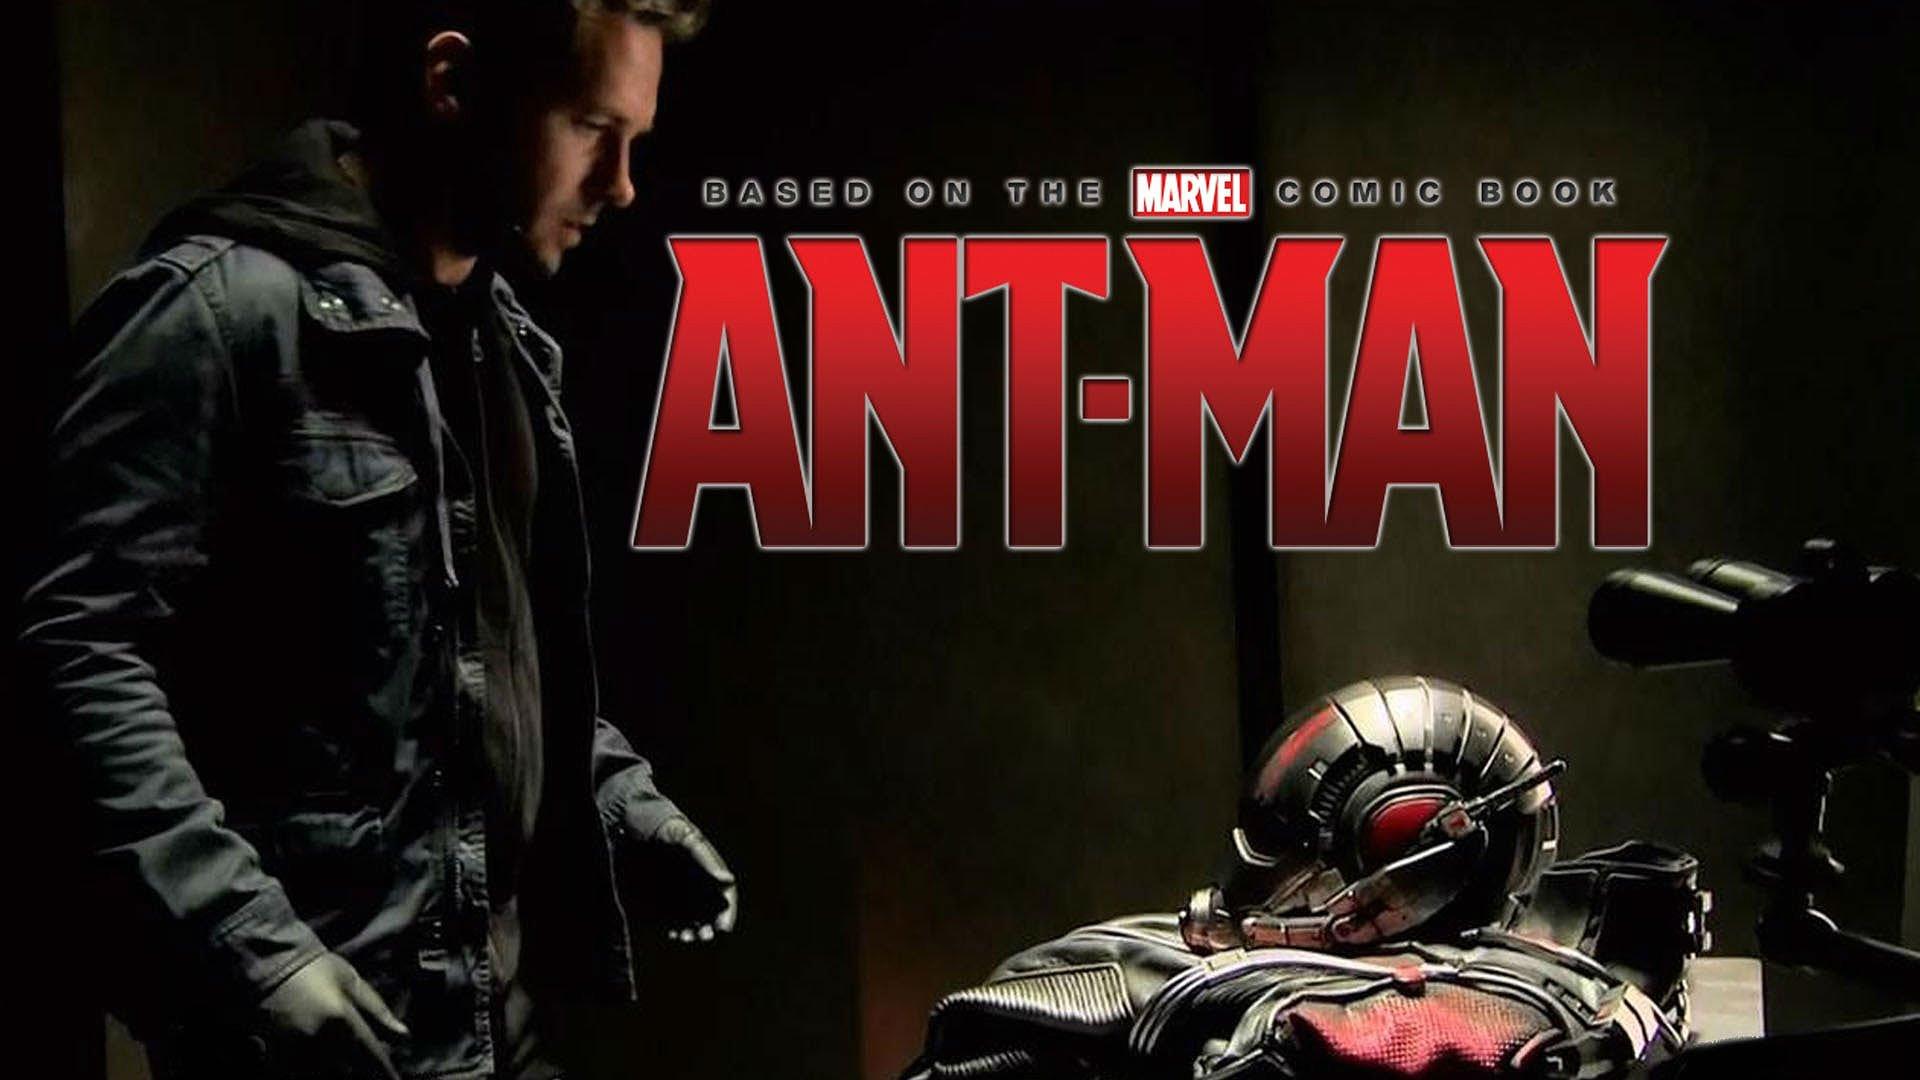 Ant-Man desktop wallpaper